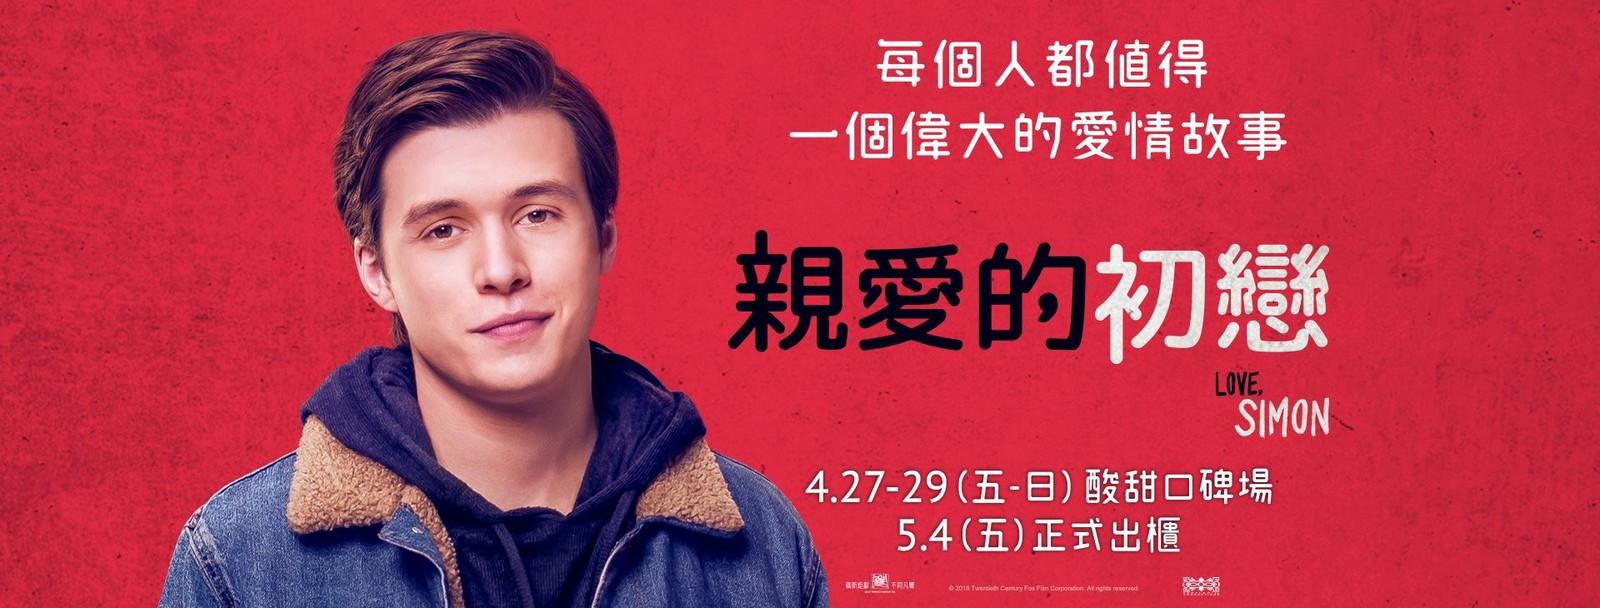 Movie, Love, Simon(美國) / 親愛的初戀(台) / 抱抱我的初戀(港) / 爱你,西蒙(網), 電影海報, 台灣, 橫版